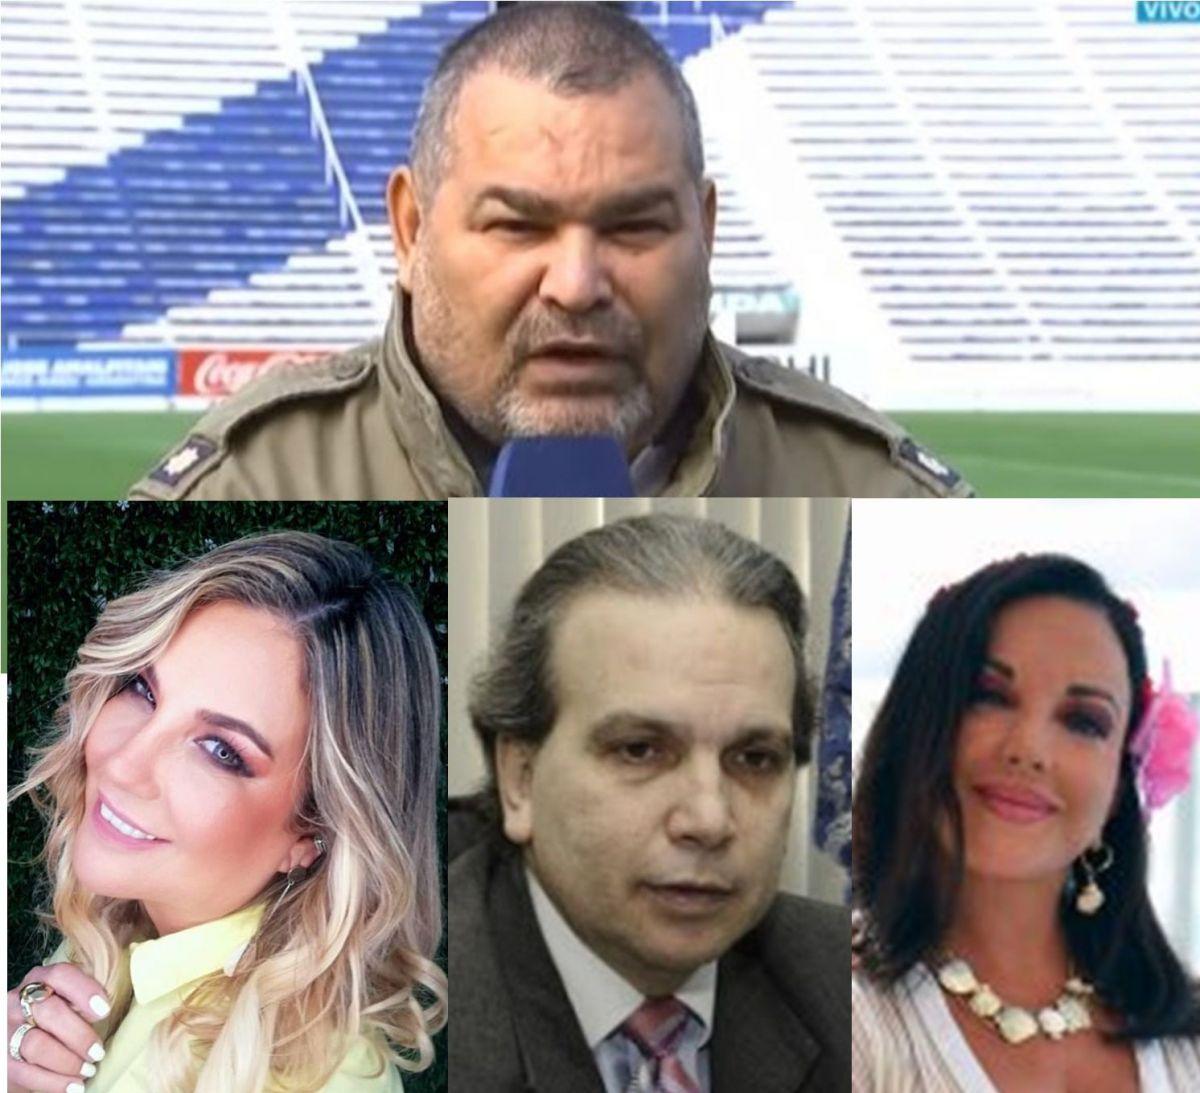 Chila se cruzó en twitter con Bibi, Delgado y Zuni. GENTILEZA